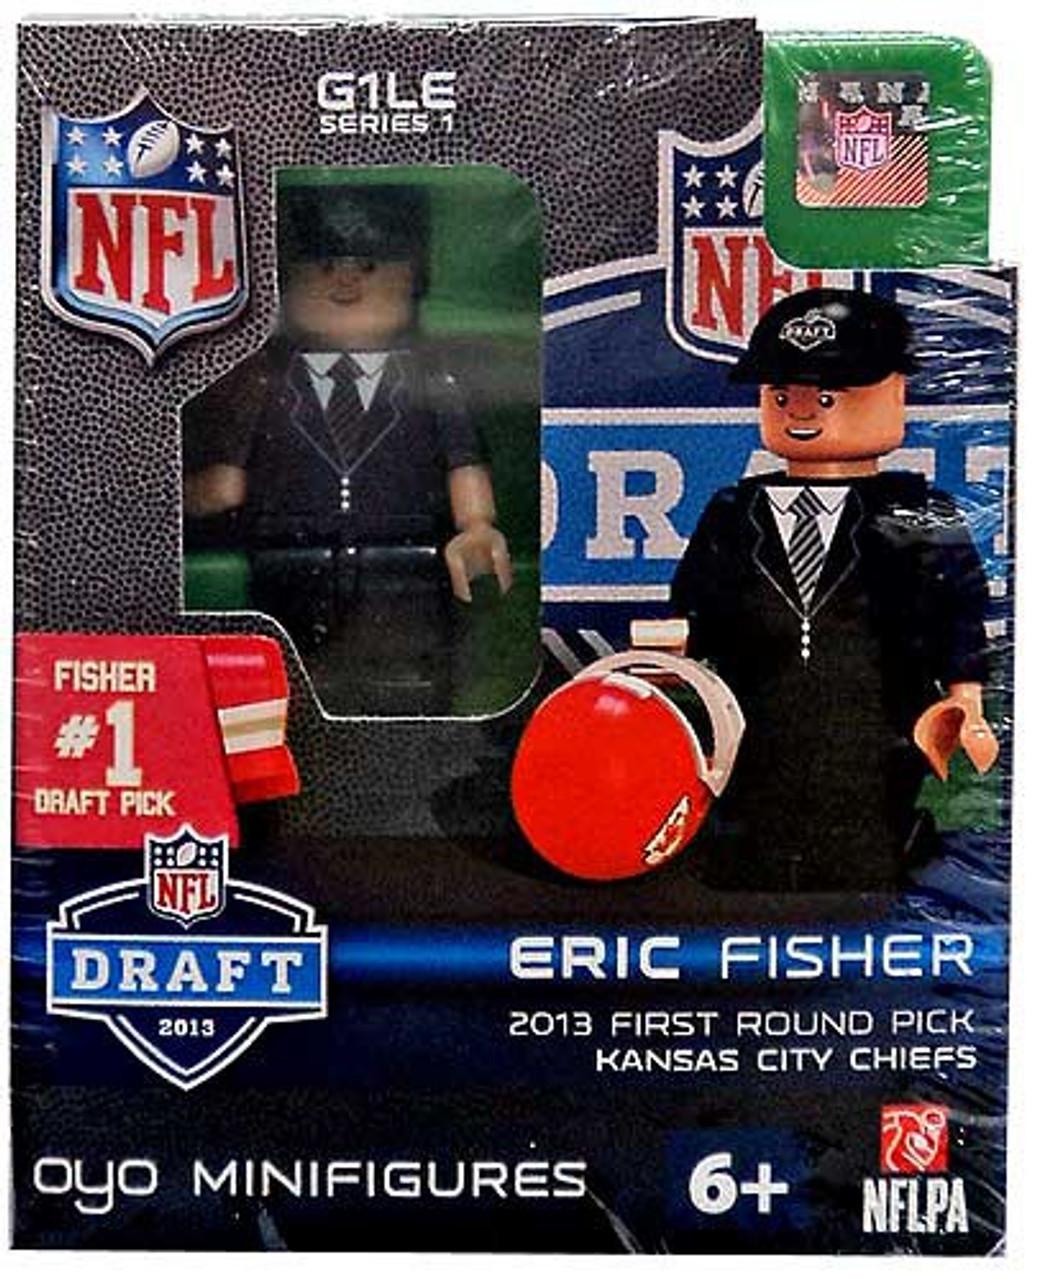 Kansas City Chiefs NFL 2013 Draft First Round Picks Eric Fisher Minifigure